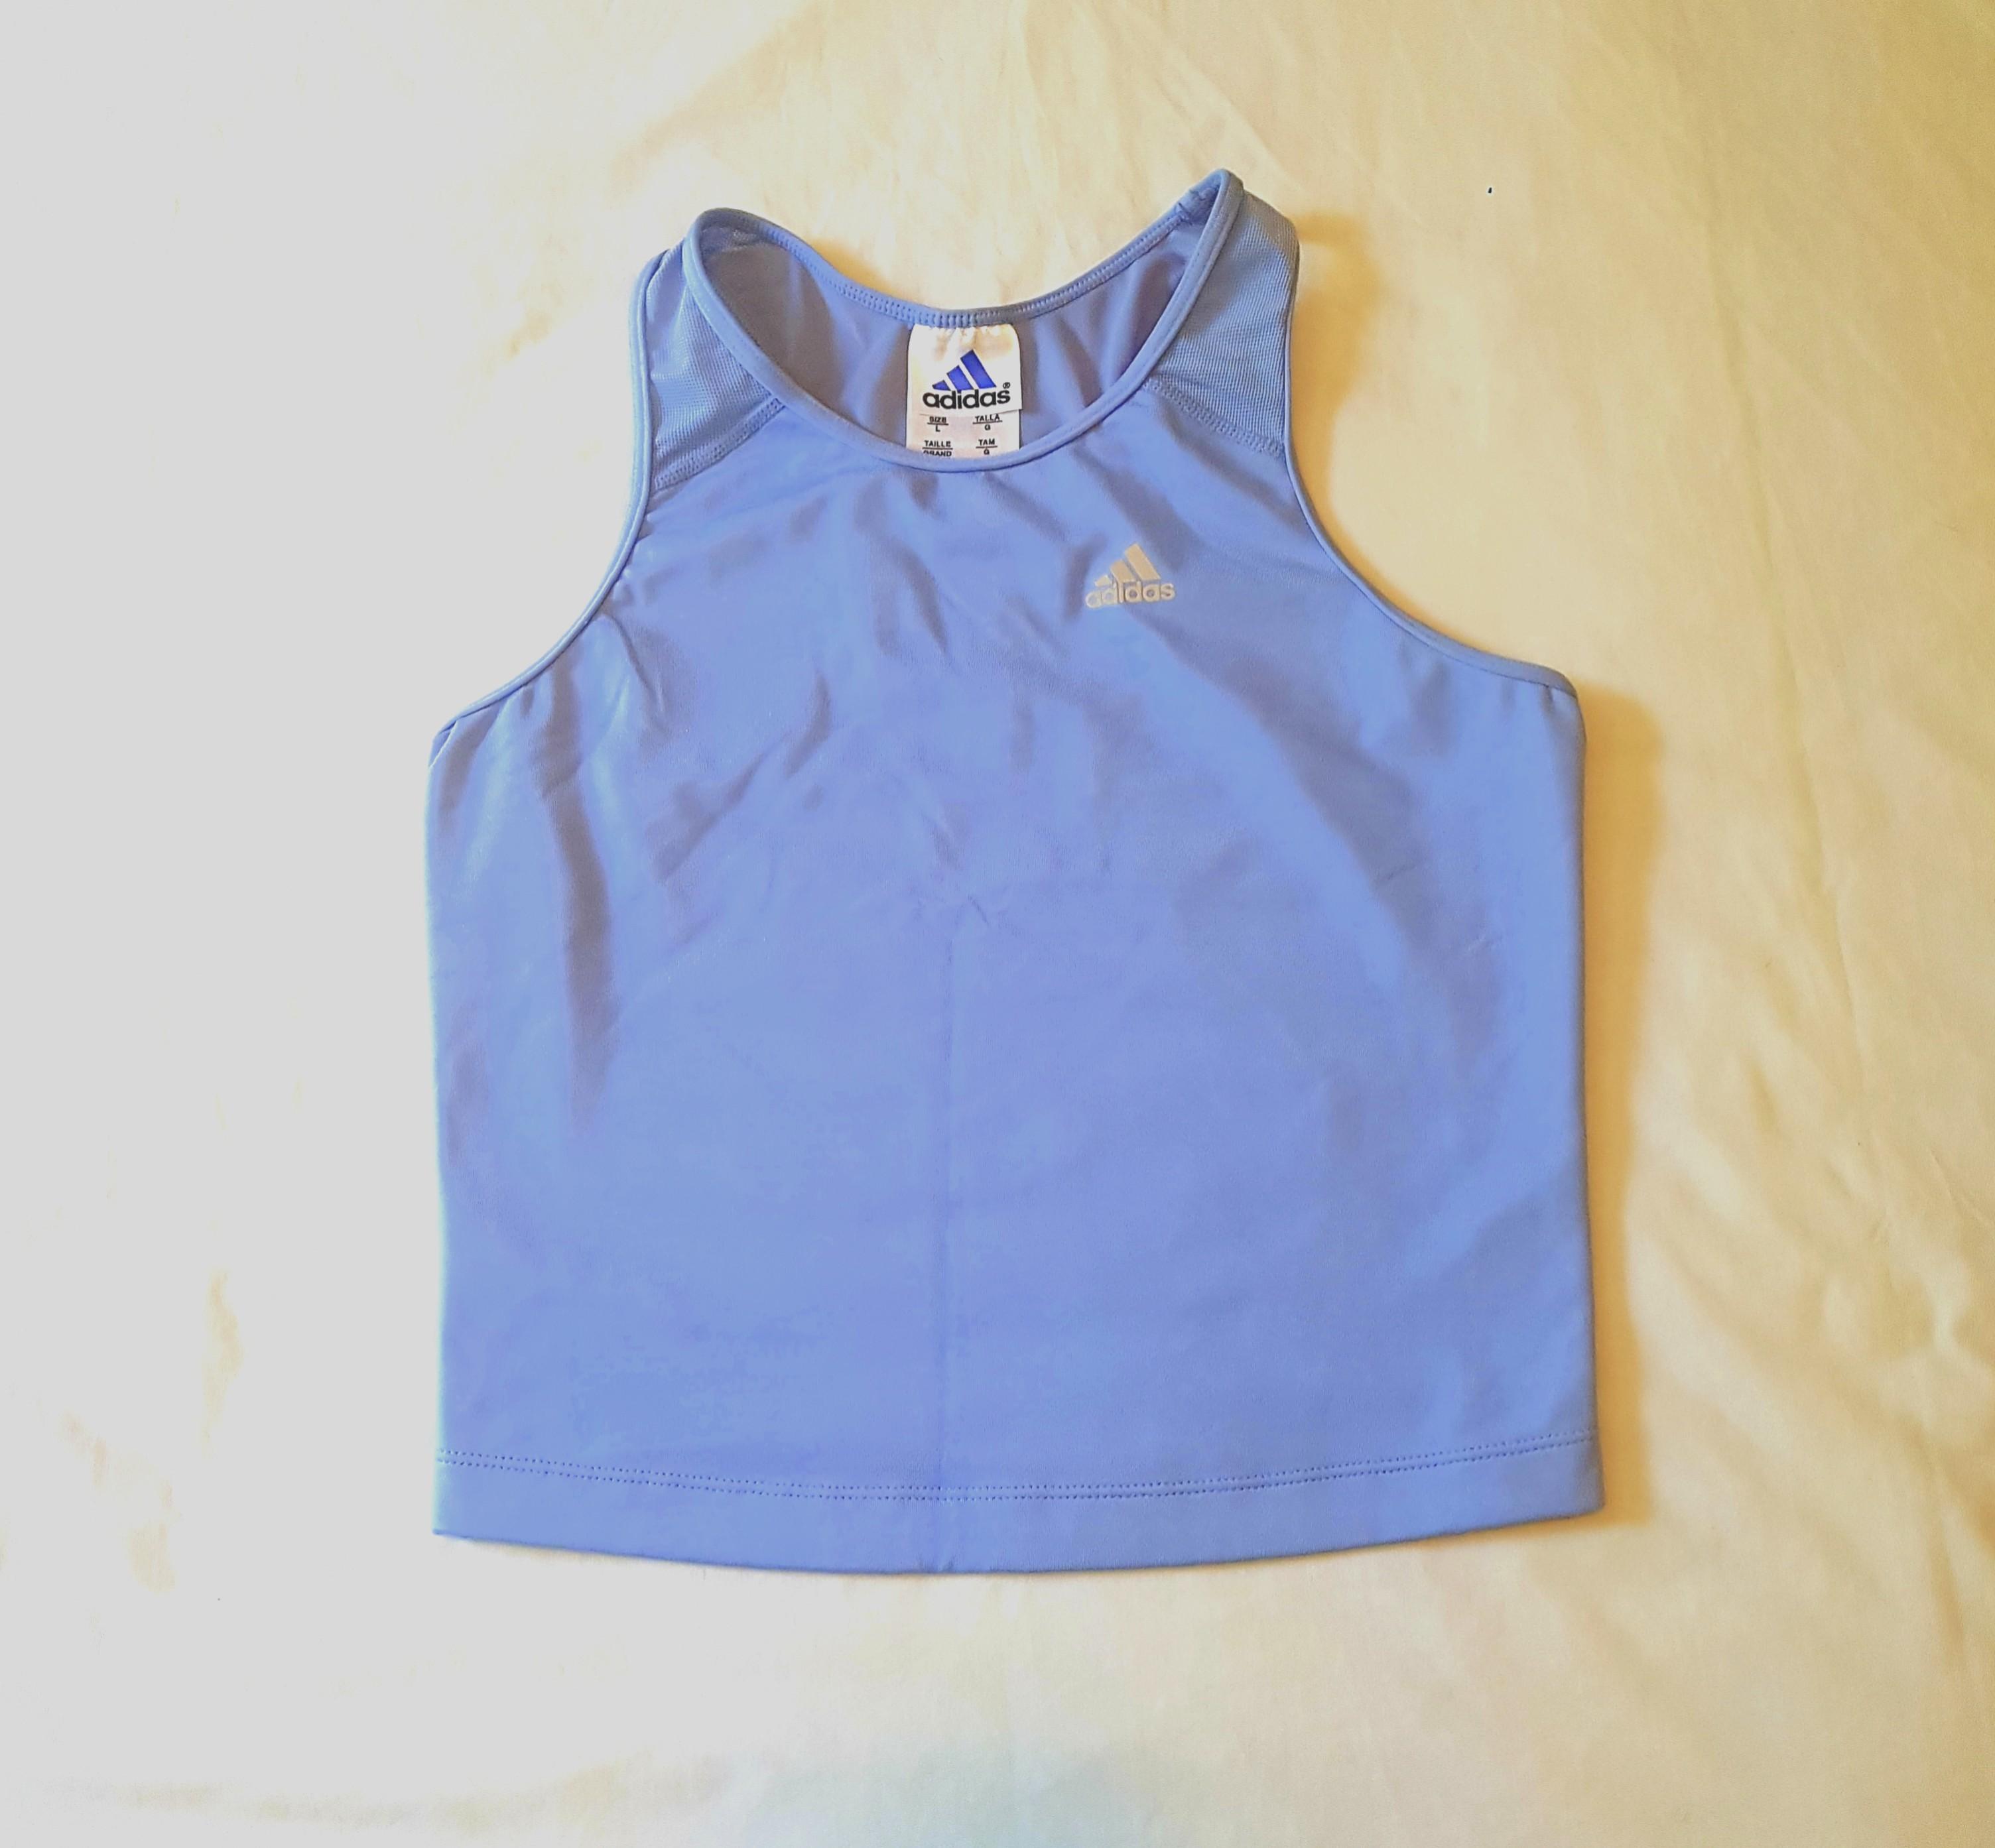 Adidas ClimaLite top